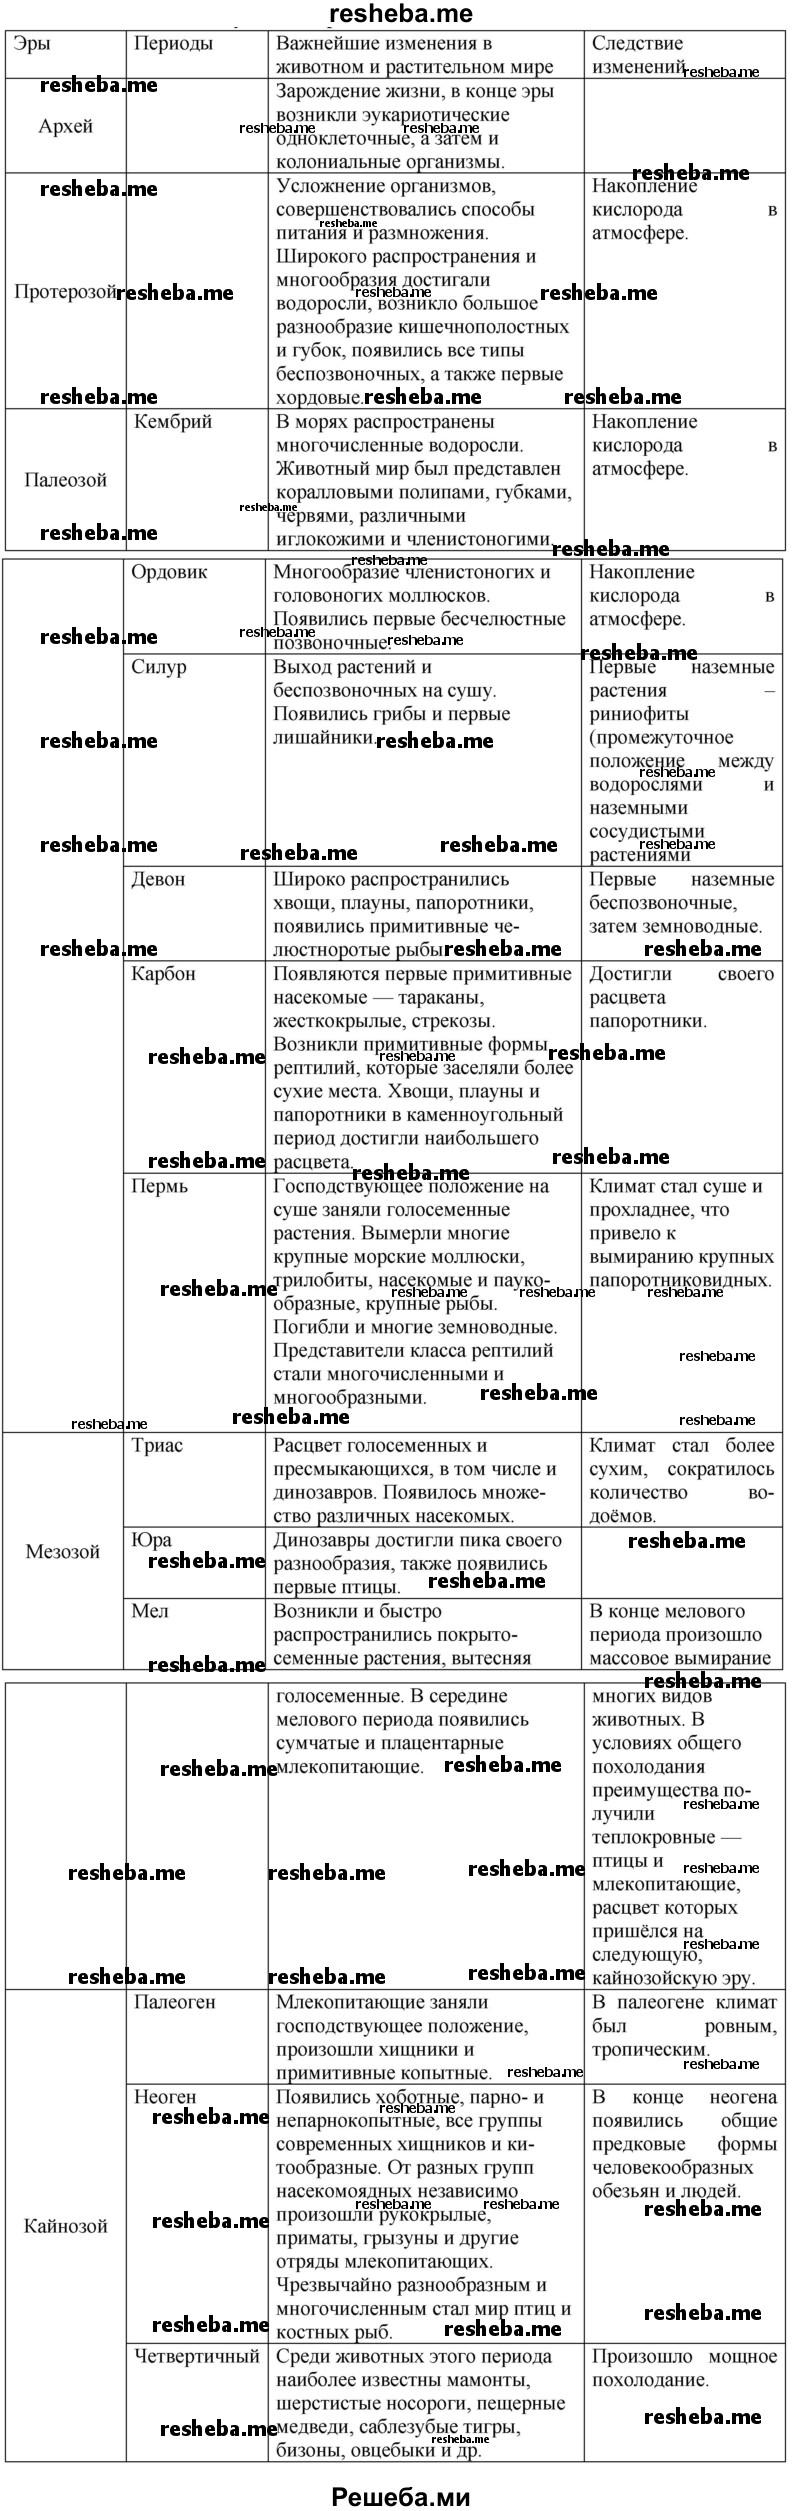 биология 9 класс работа с моделями схемами таблицами